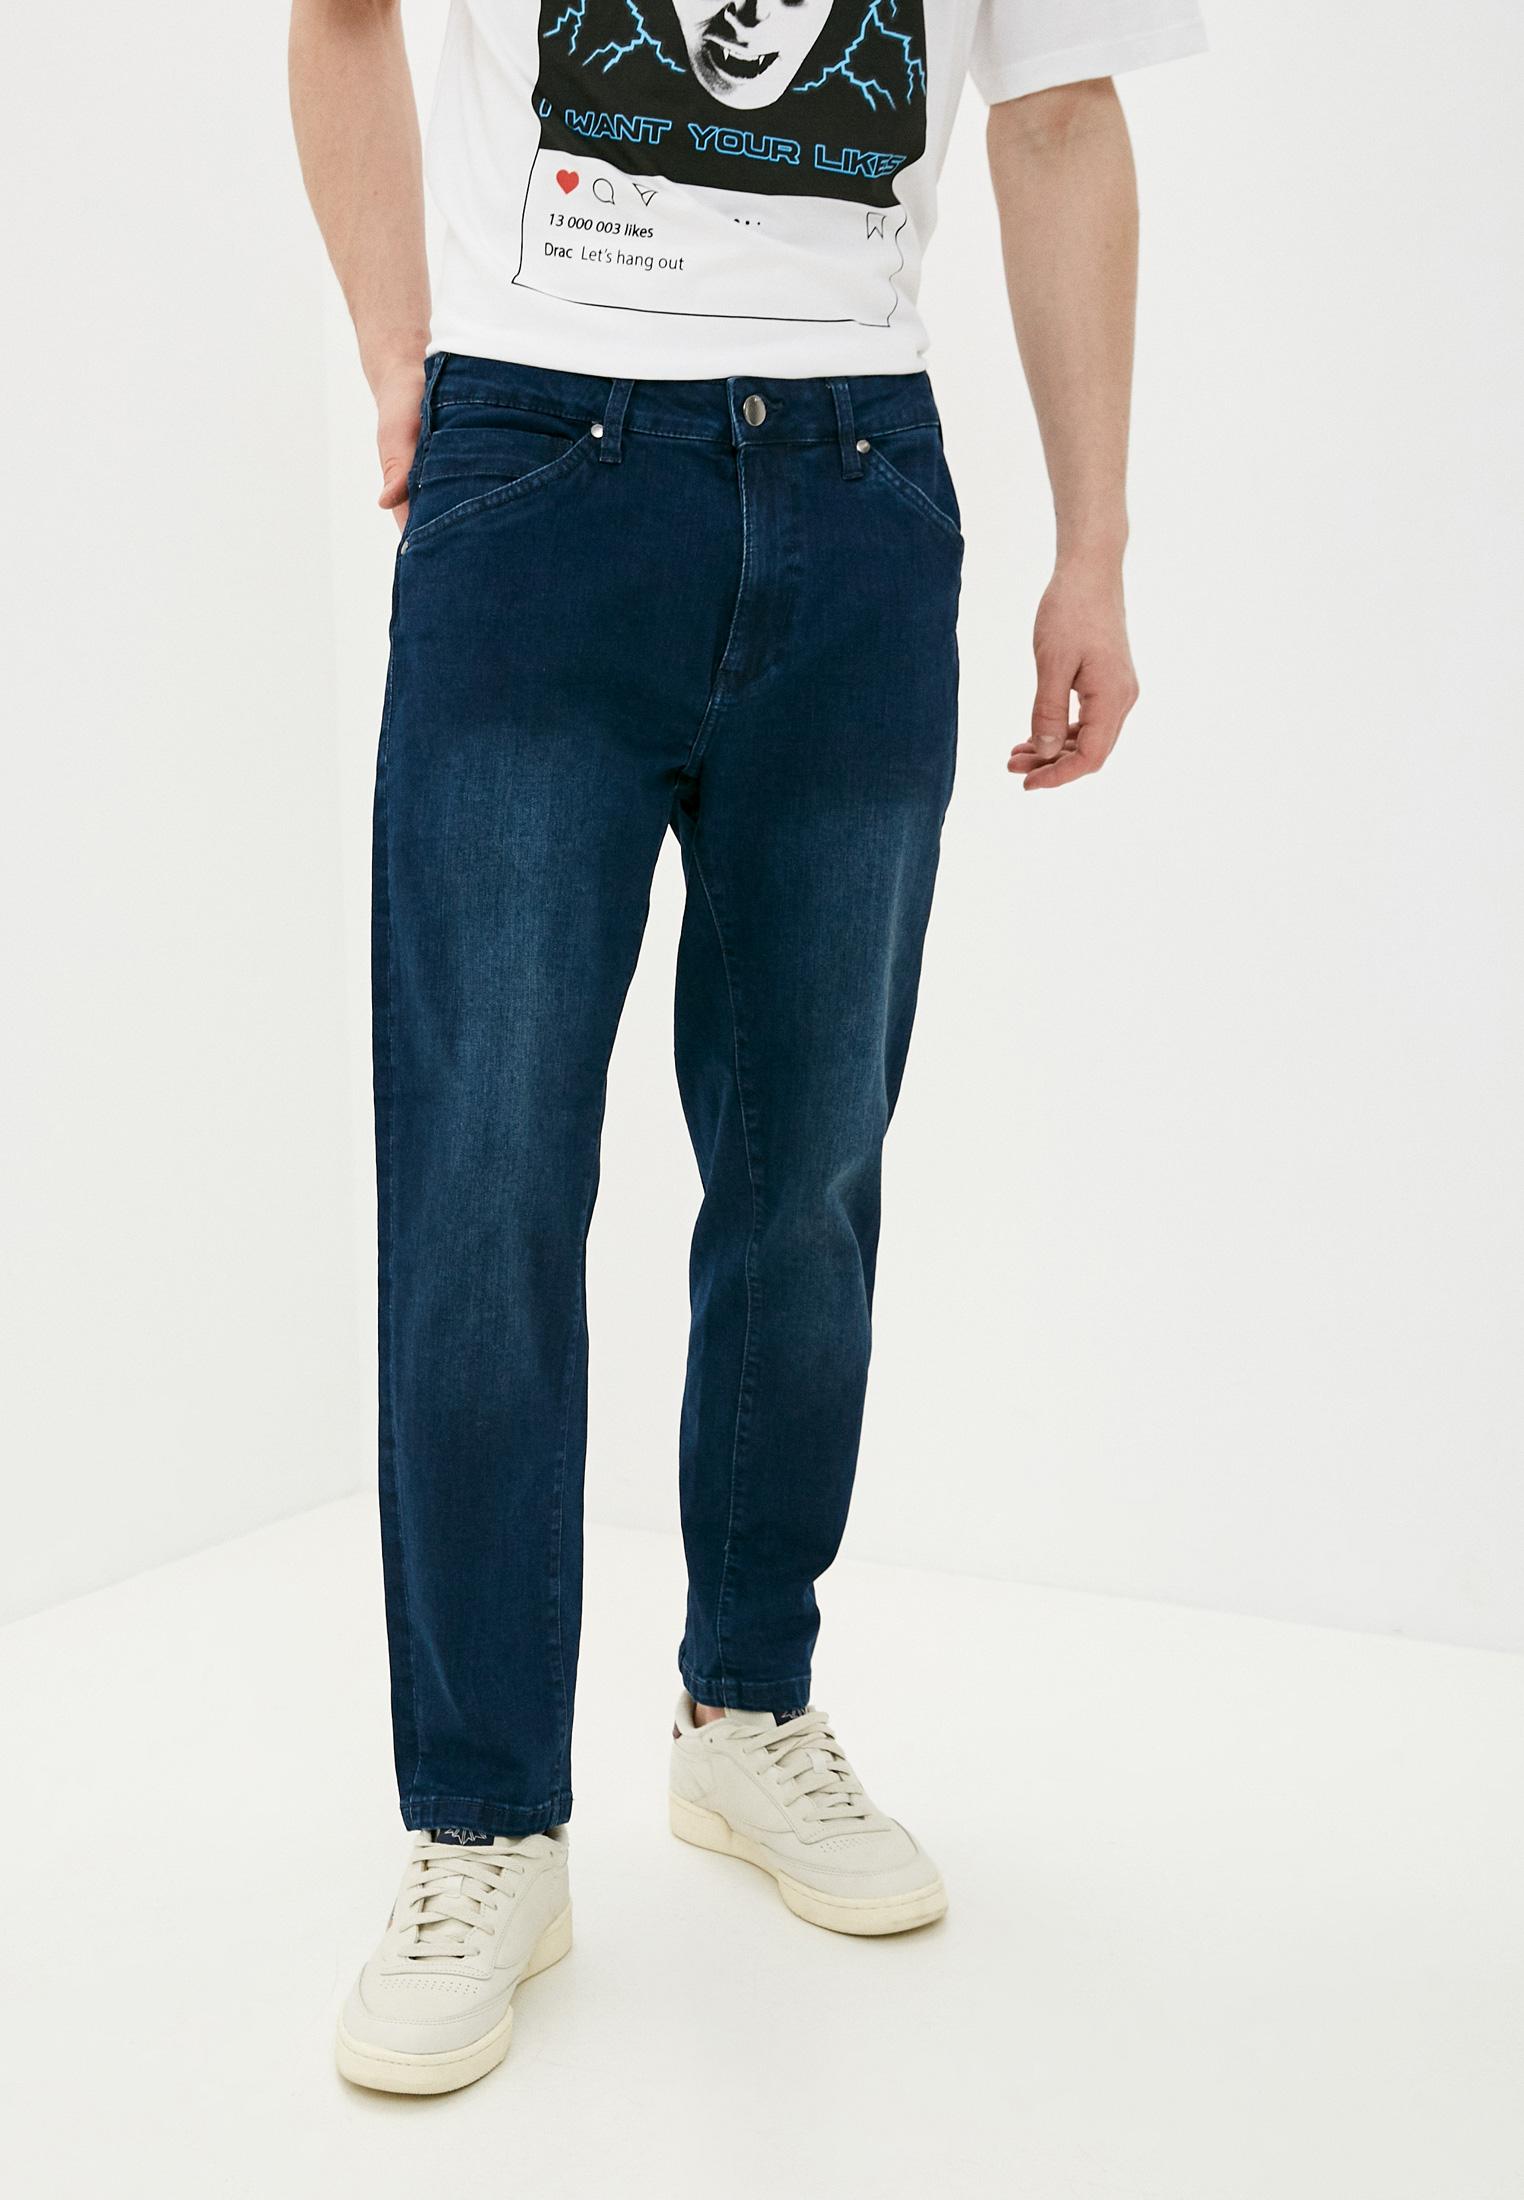 Зауженные джинсы J. Hart & Bros 5625391